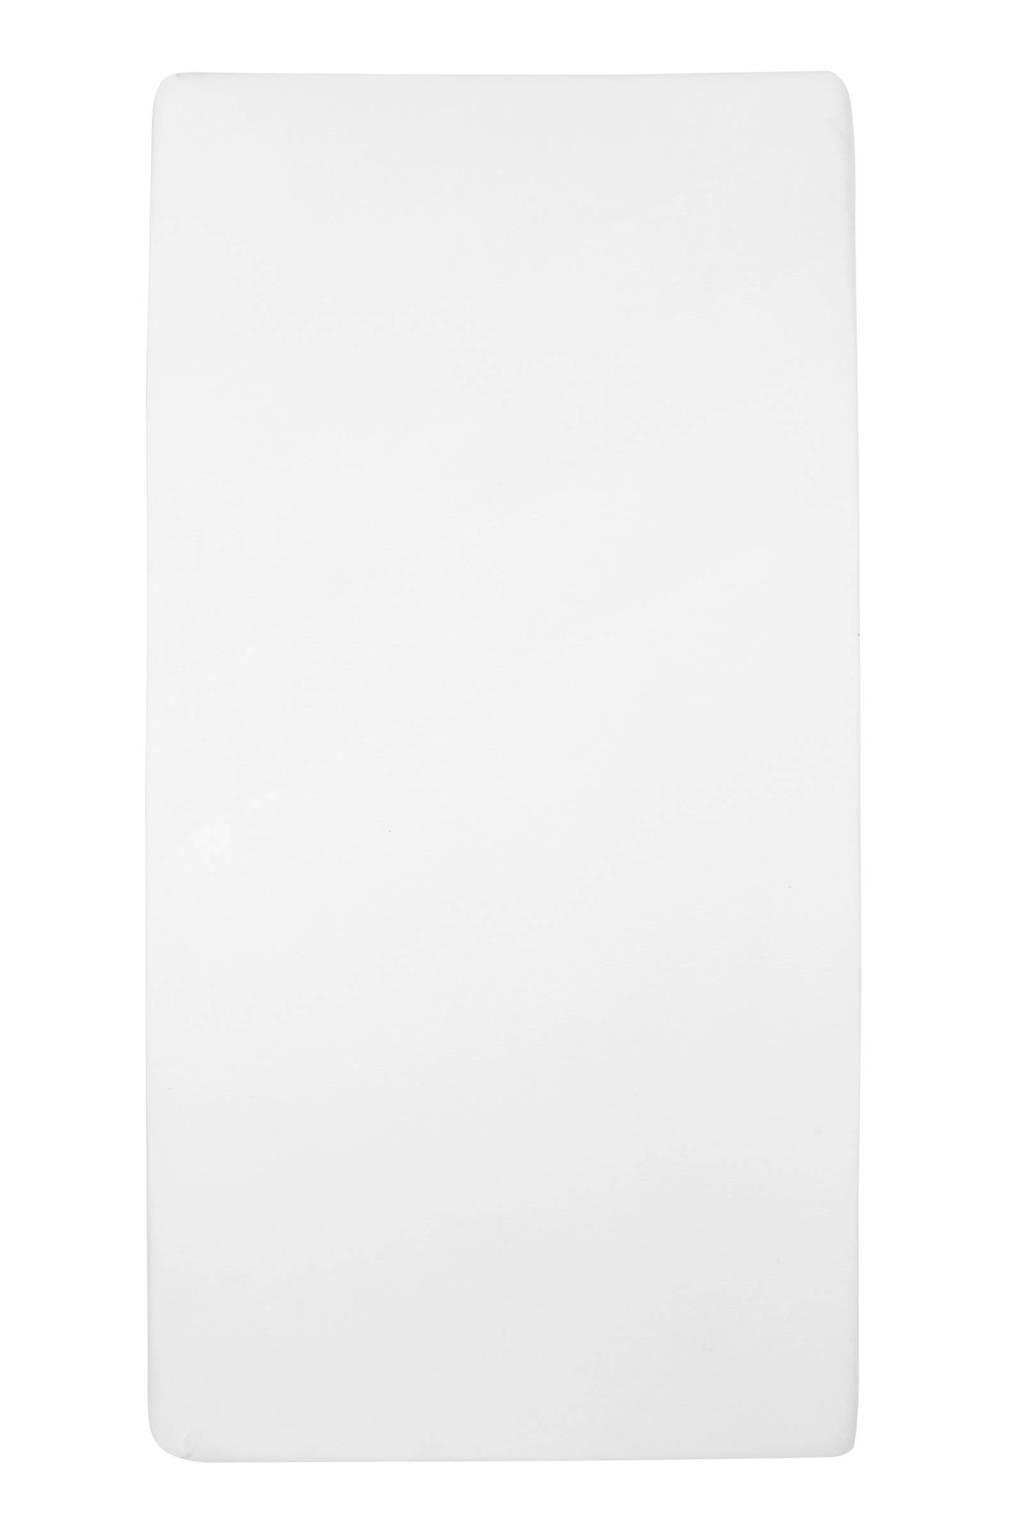 Meyco jersey hoeslaken ledikant 60x120 cm Wit